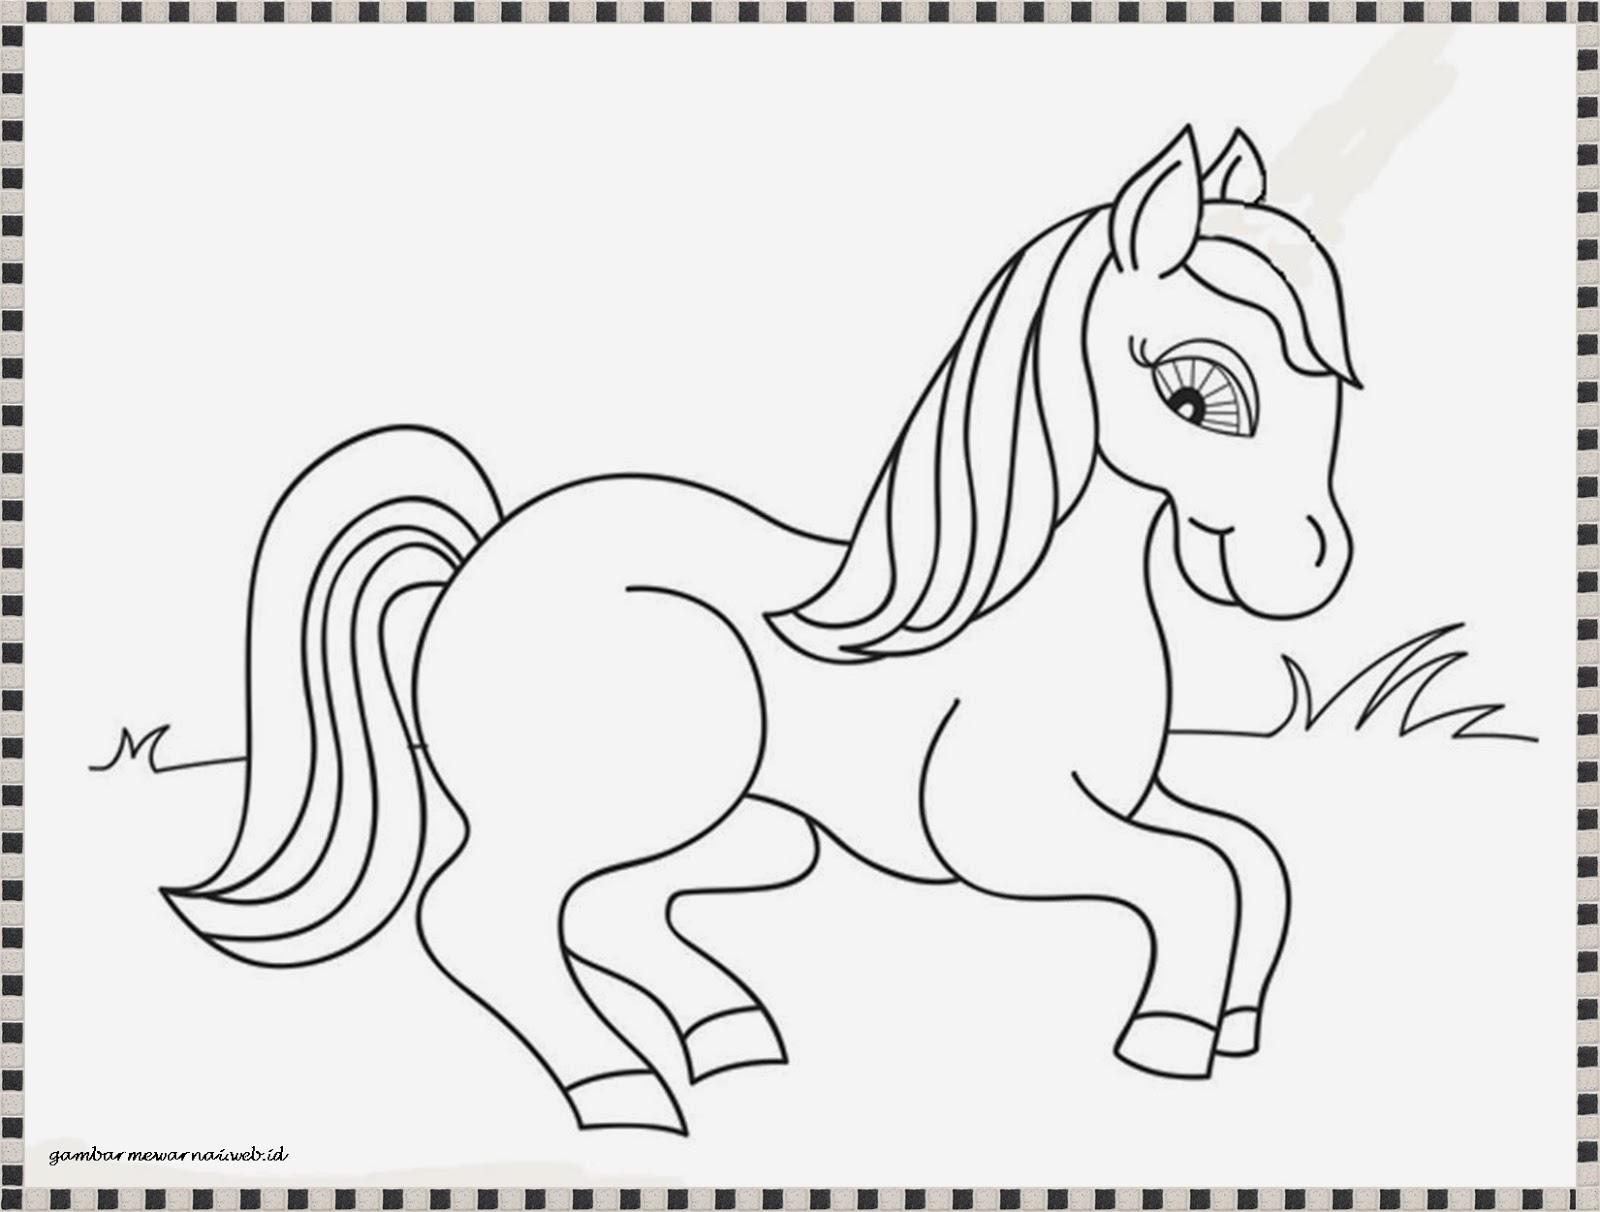 gambar kuda kartun - gambar kuda